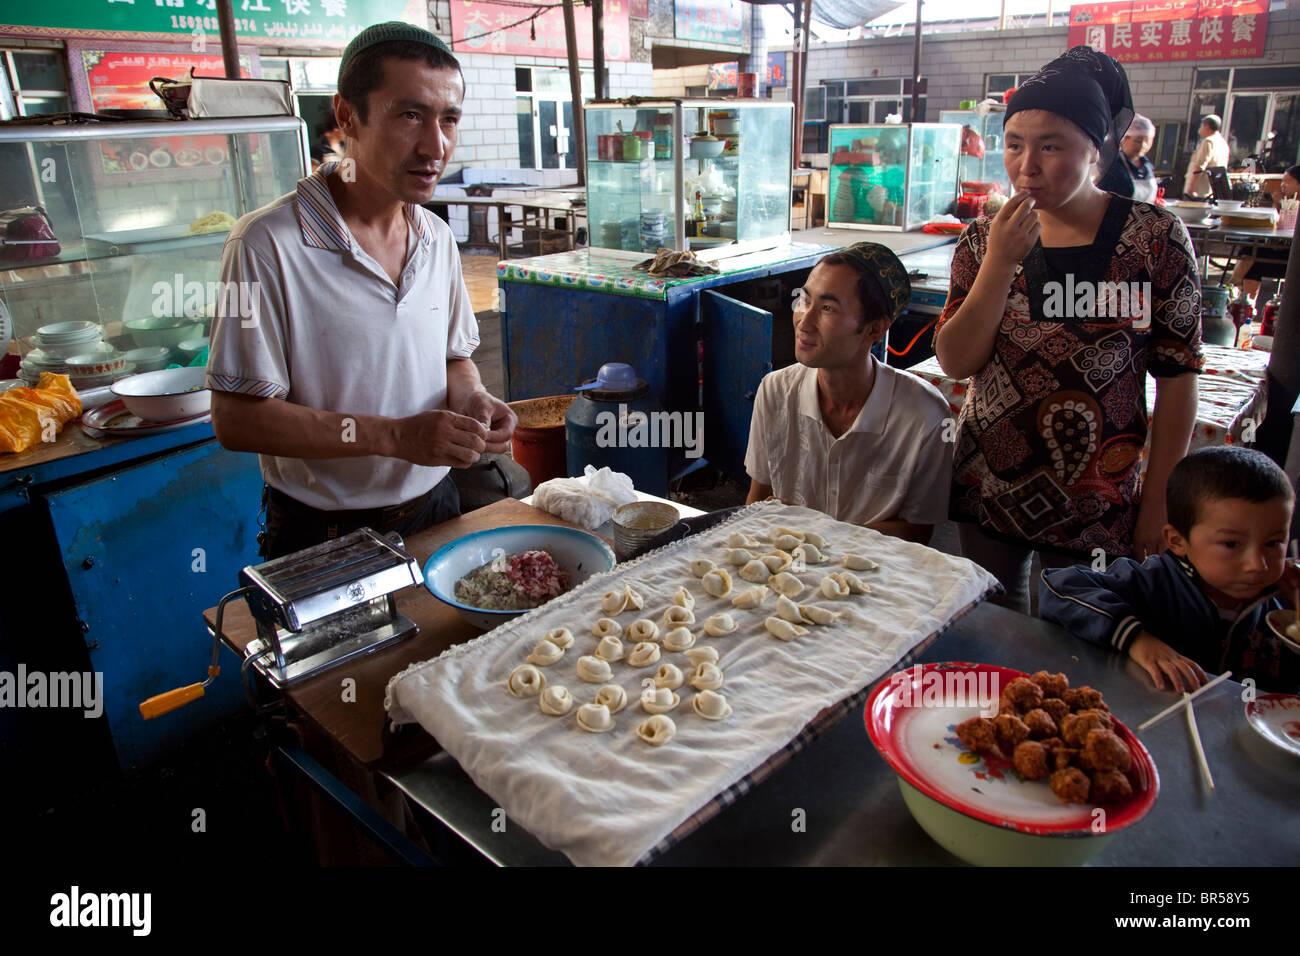 Food section of bazaar in Turpan Xinjiang China. - Stock Image